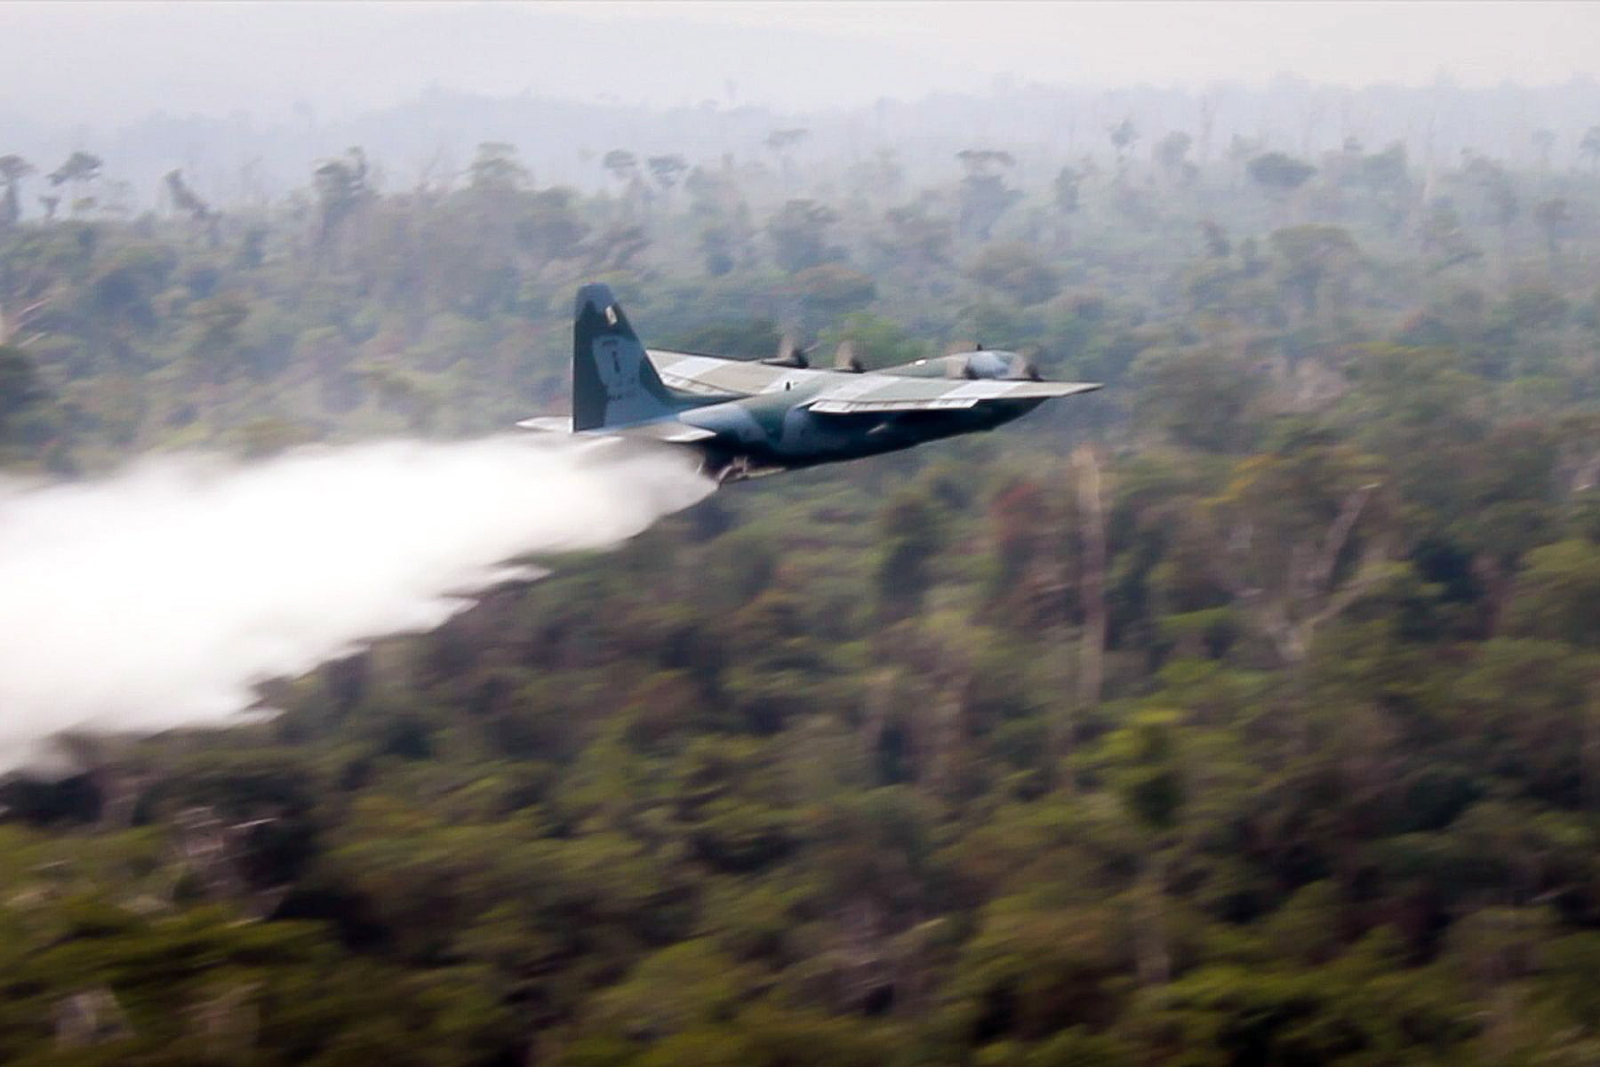 EPA/BRAZIL AIR FORCE